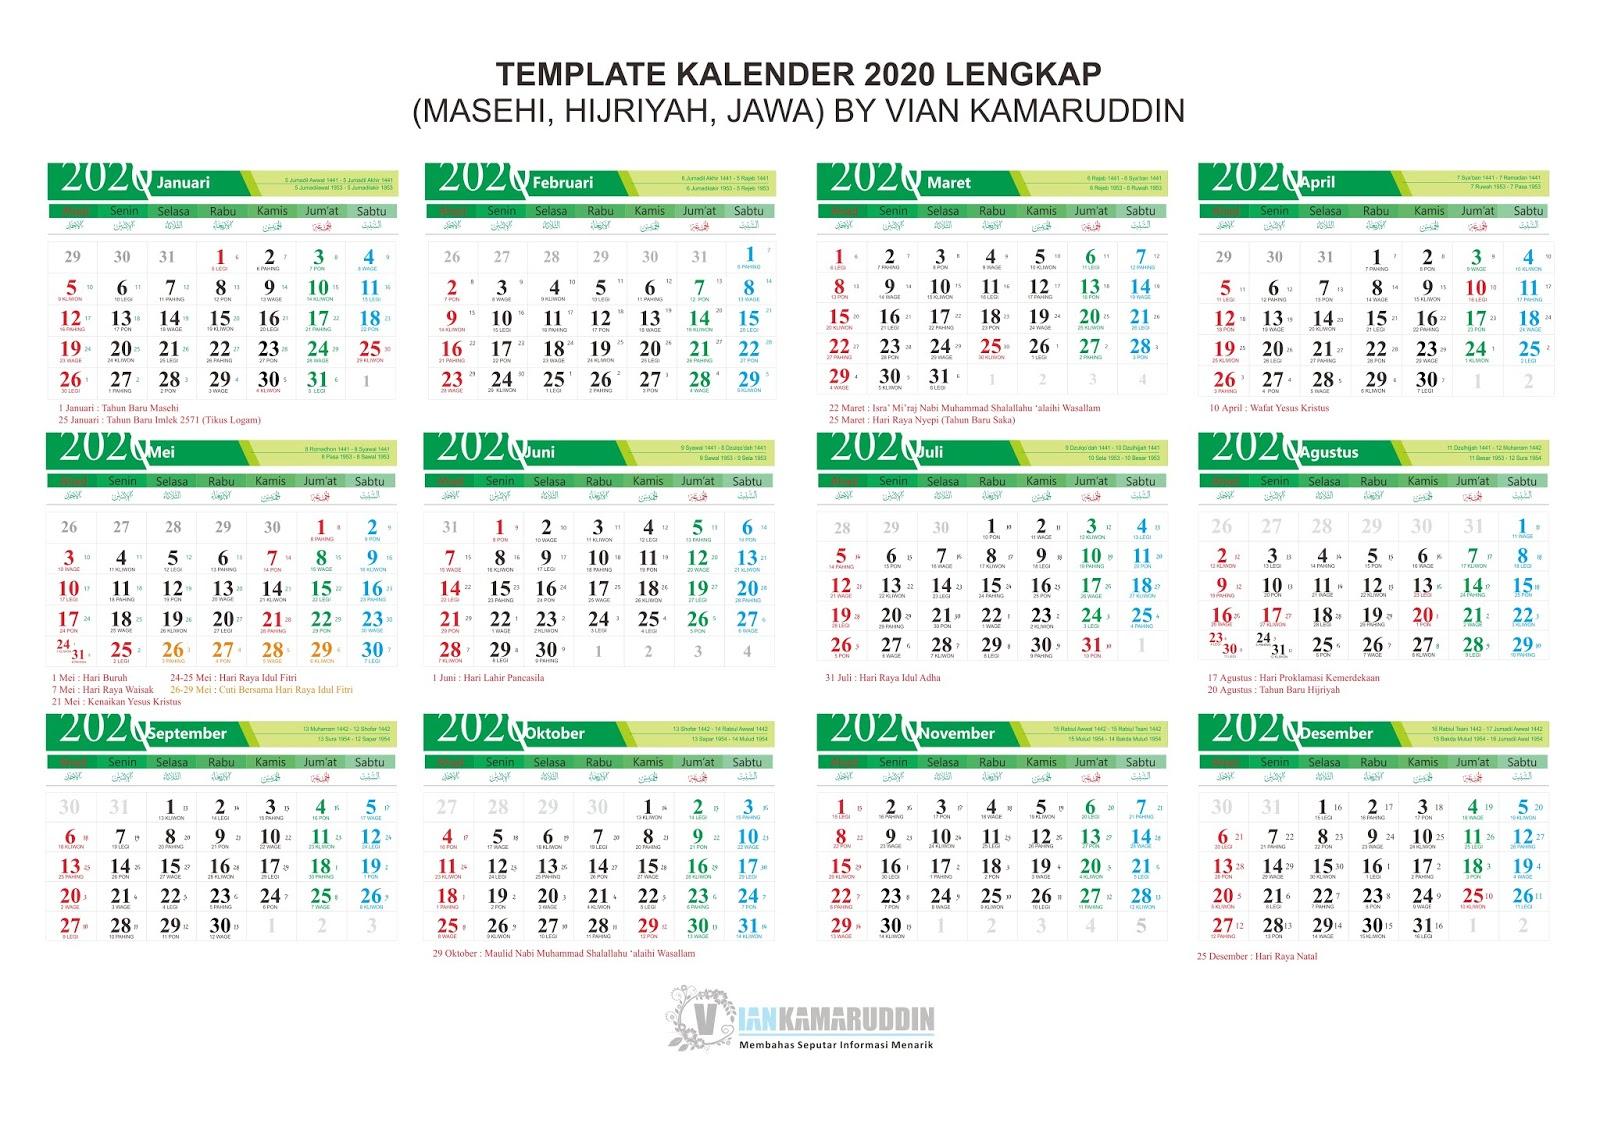 Kalender Lengkap 2020 Png Sosialpost